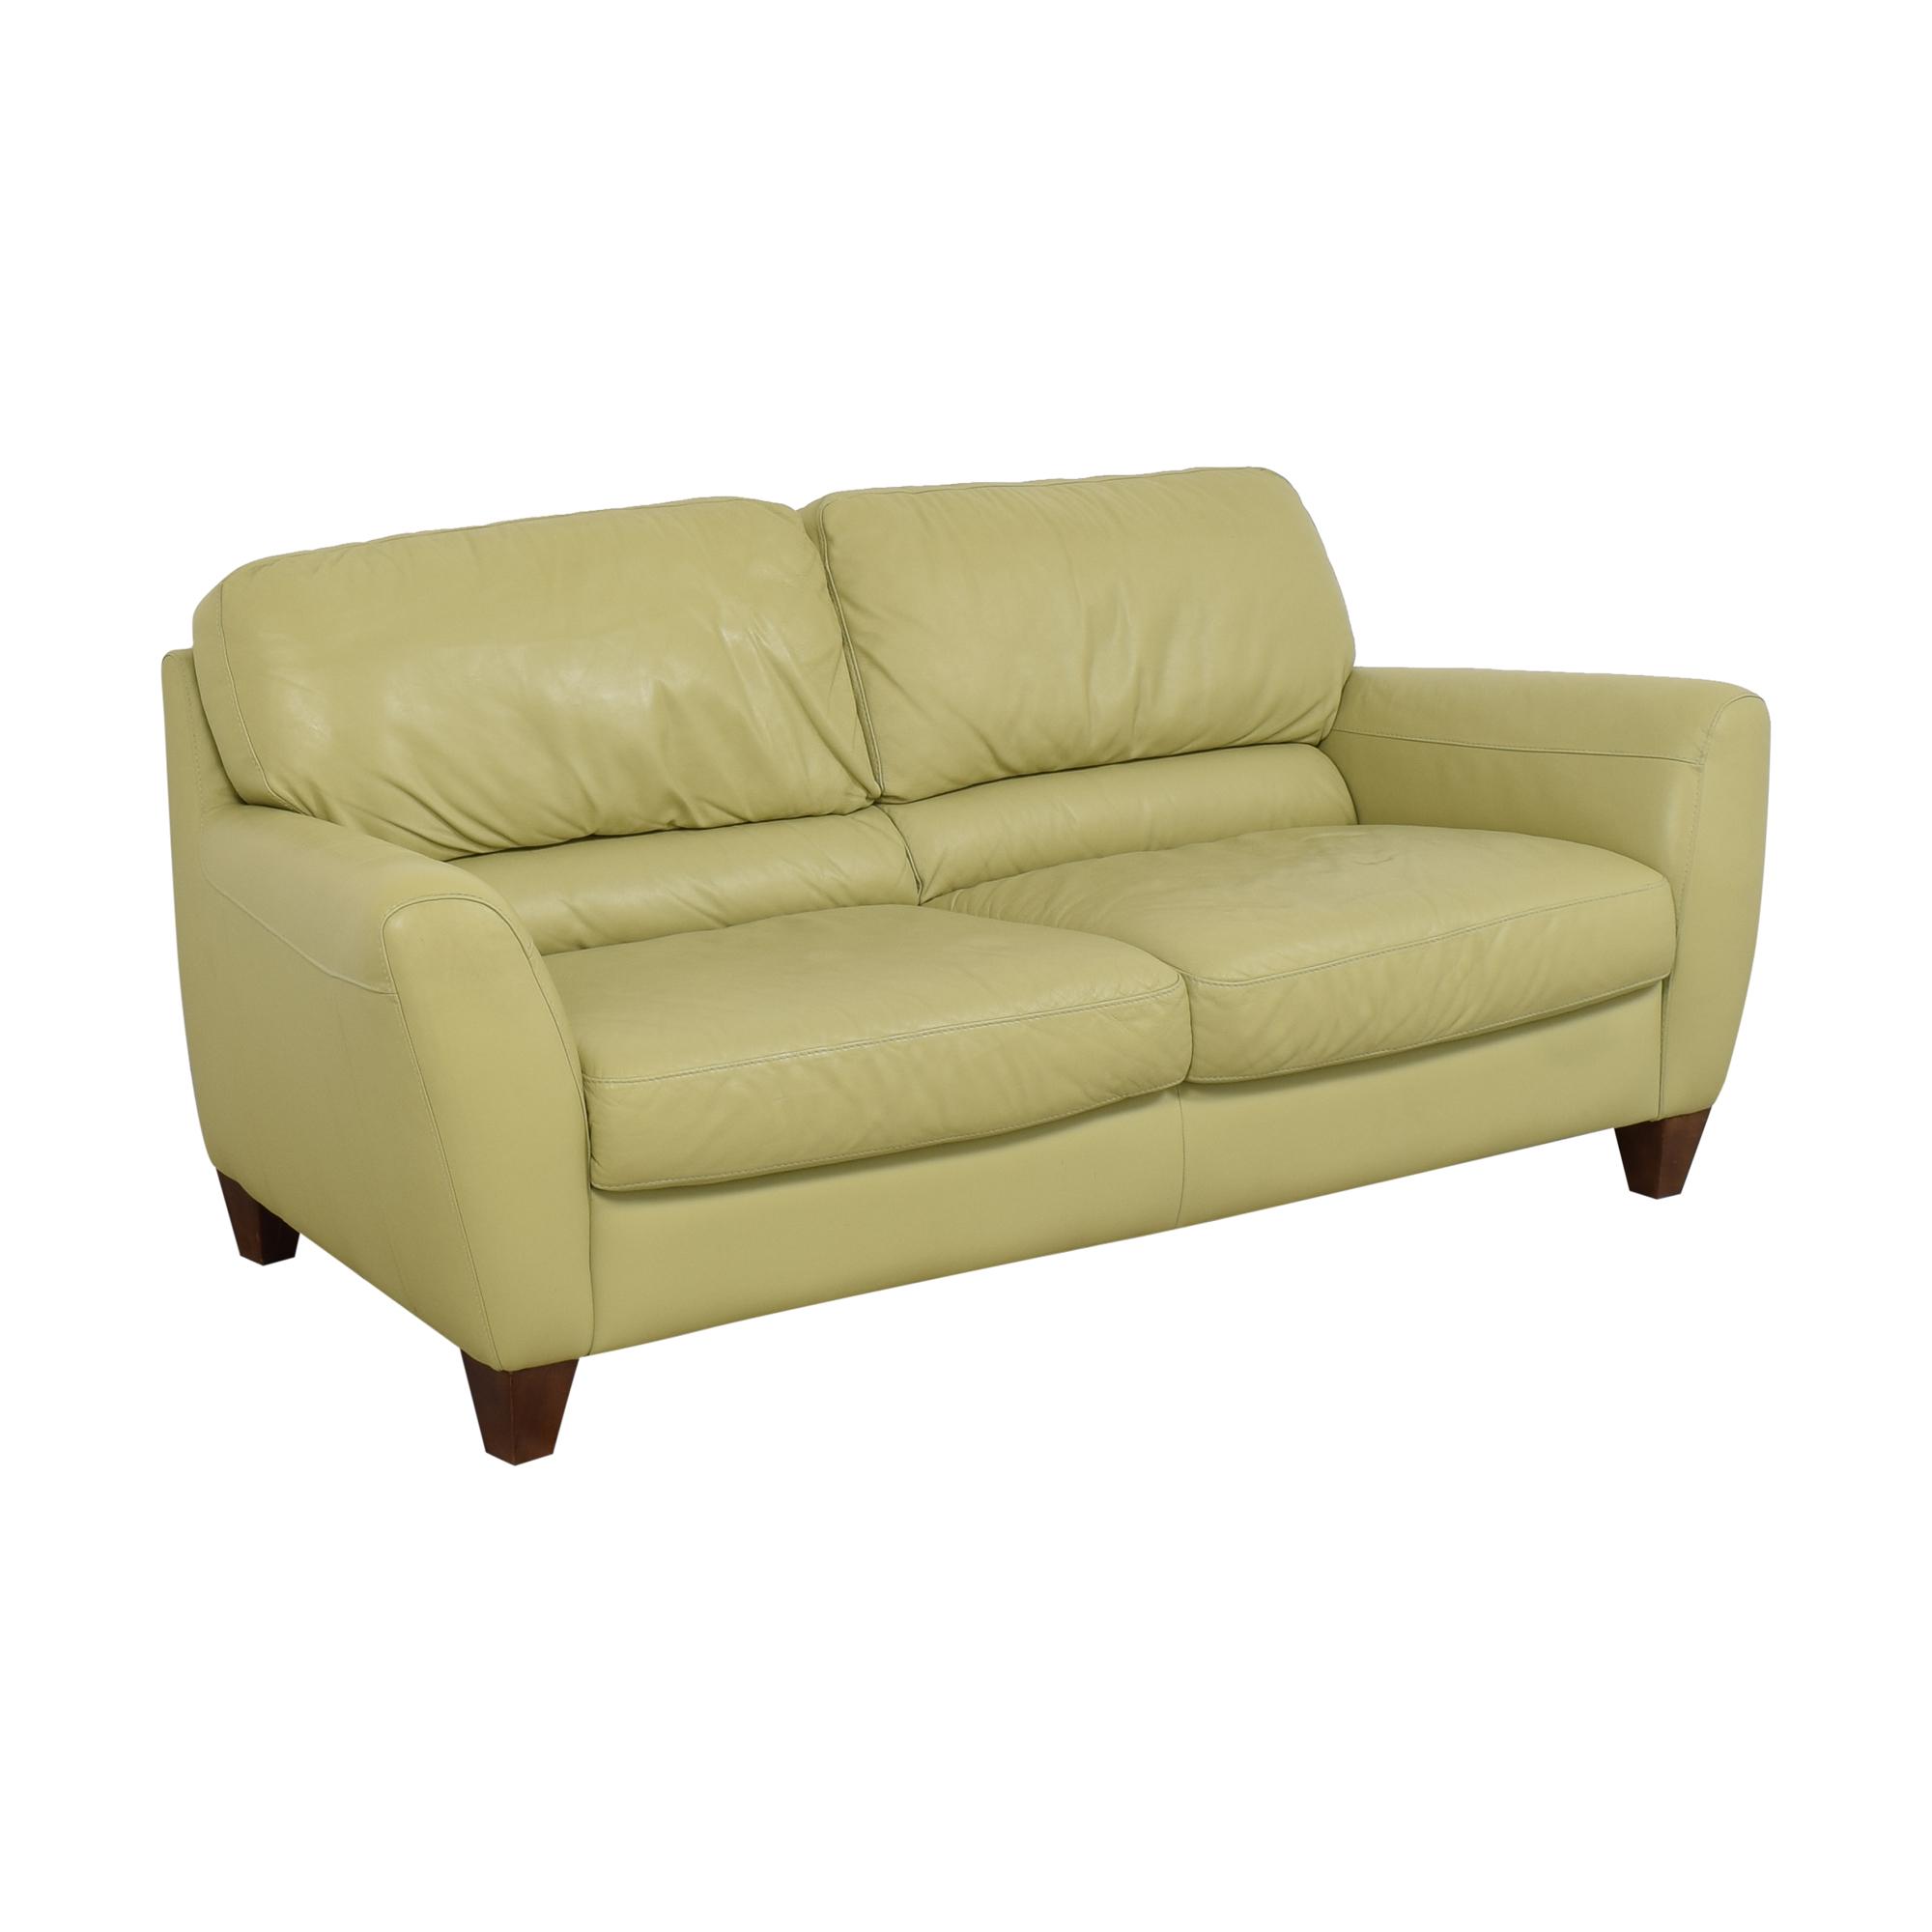 Italsofa Italsofa Two Cushion Sofa dimensions